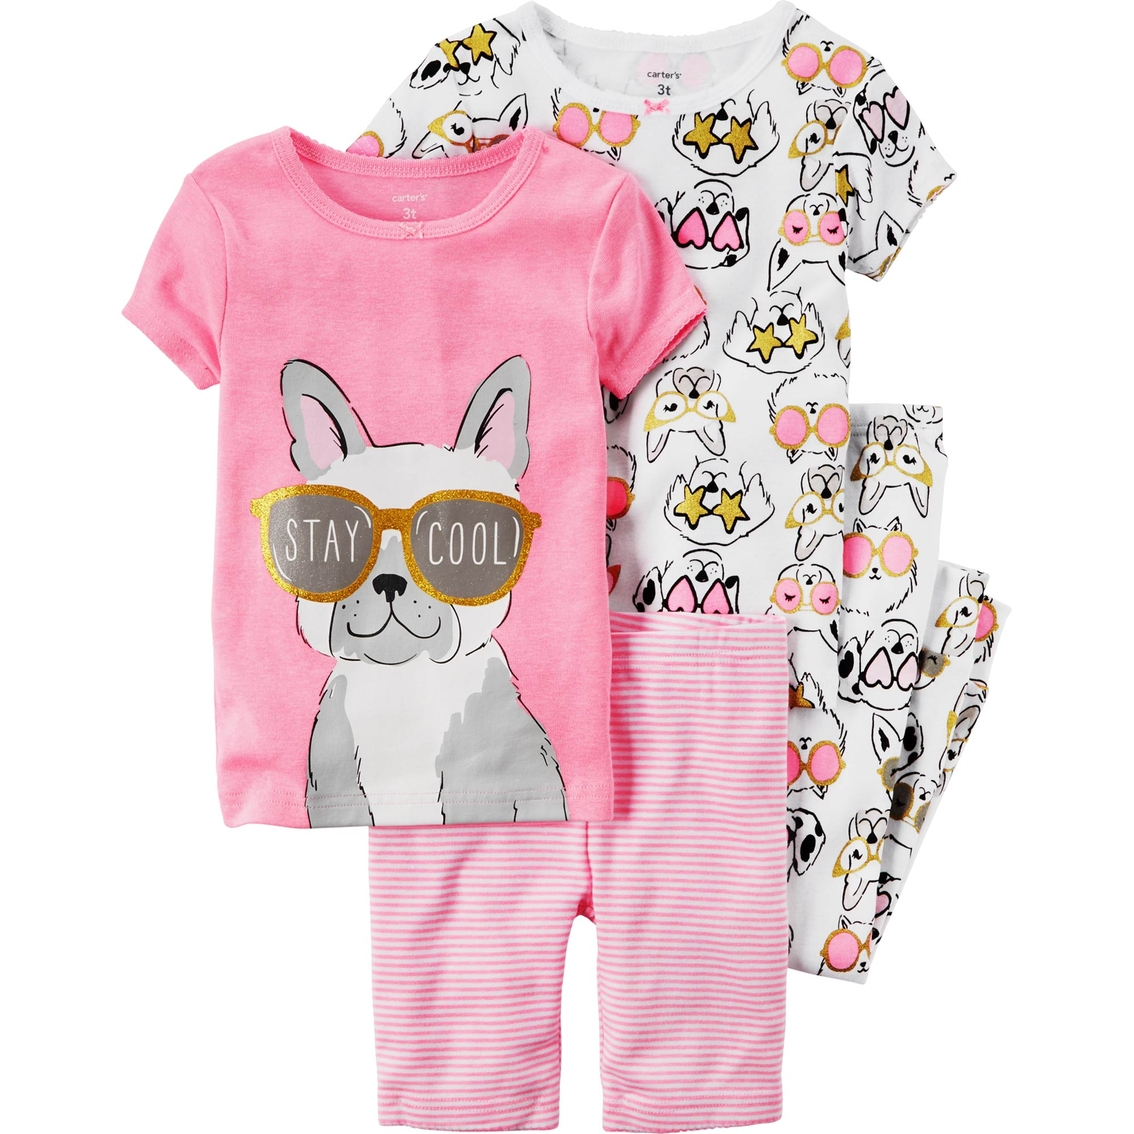 6048b50f9e55 Carter s Infant Girls 4 Pc. Dog Pajama Set